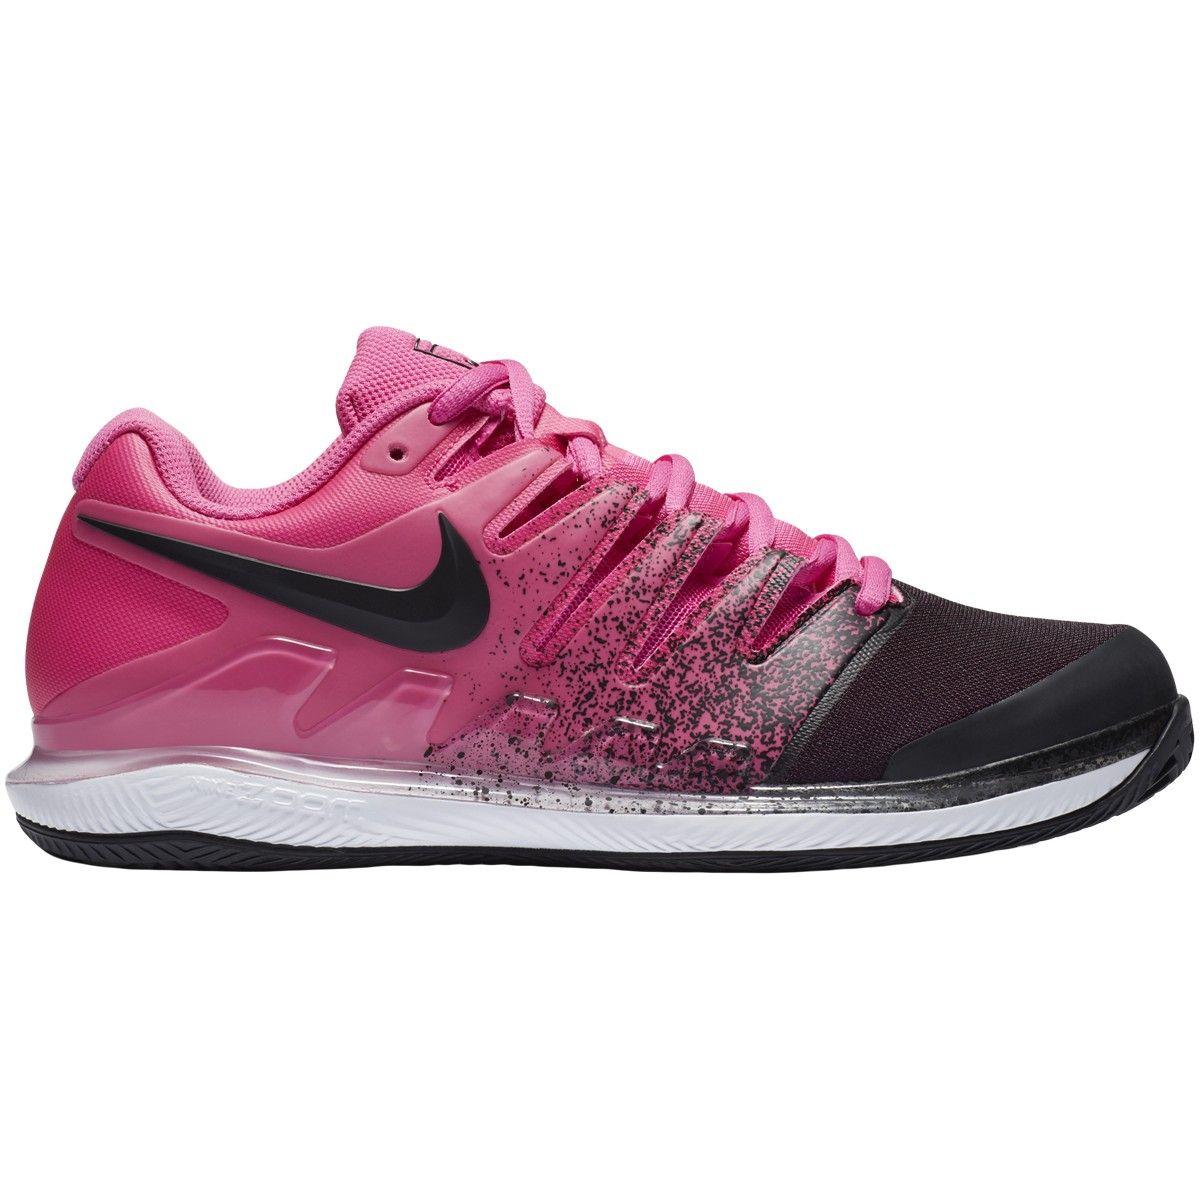 Nike Air Zoom Vapor X Clay Women's Tennis Shoes